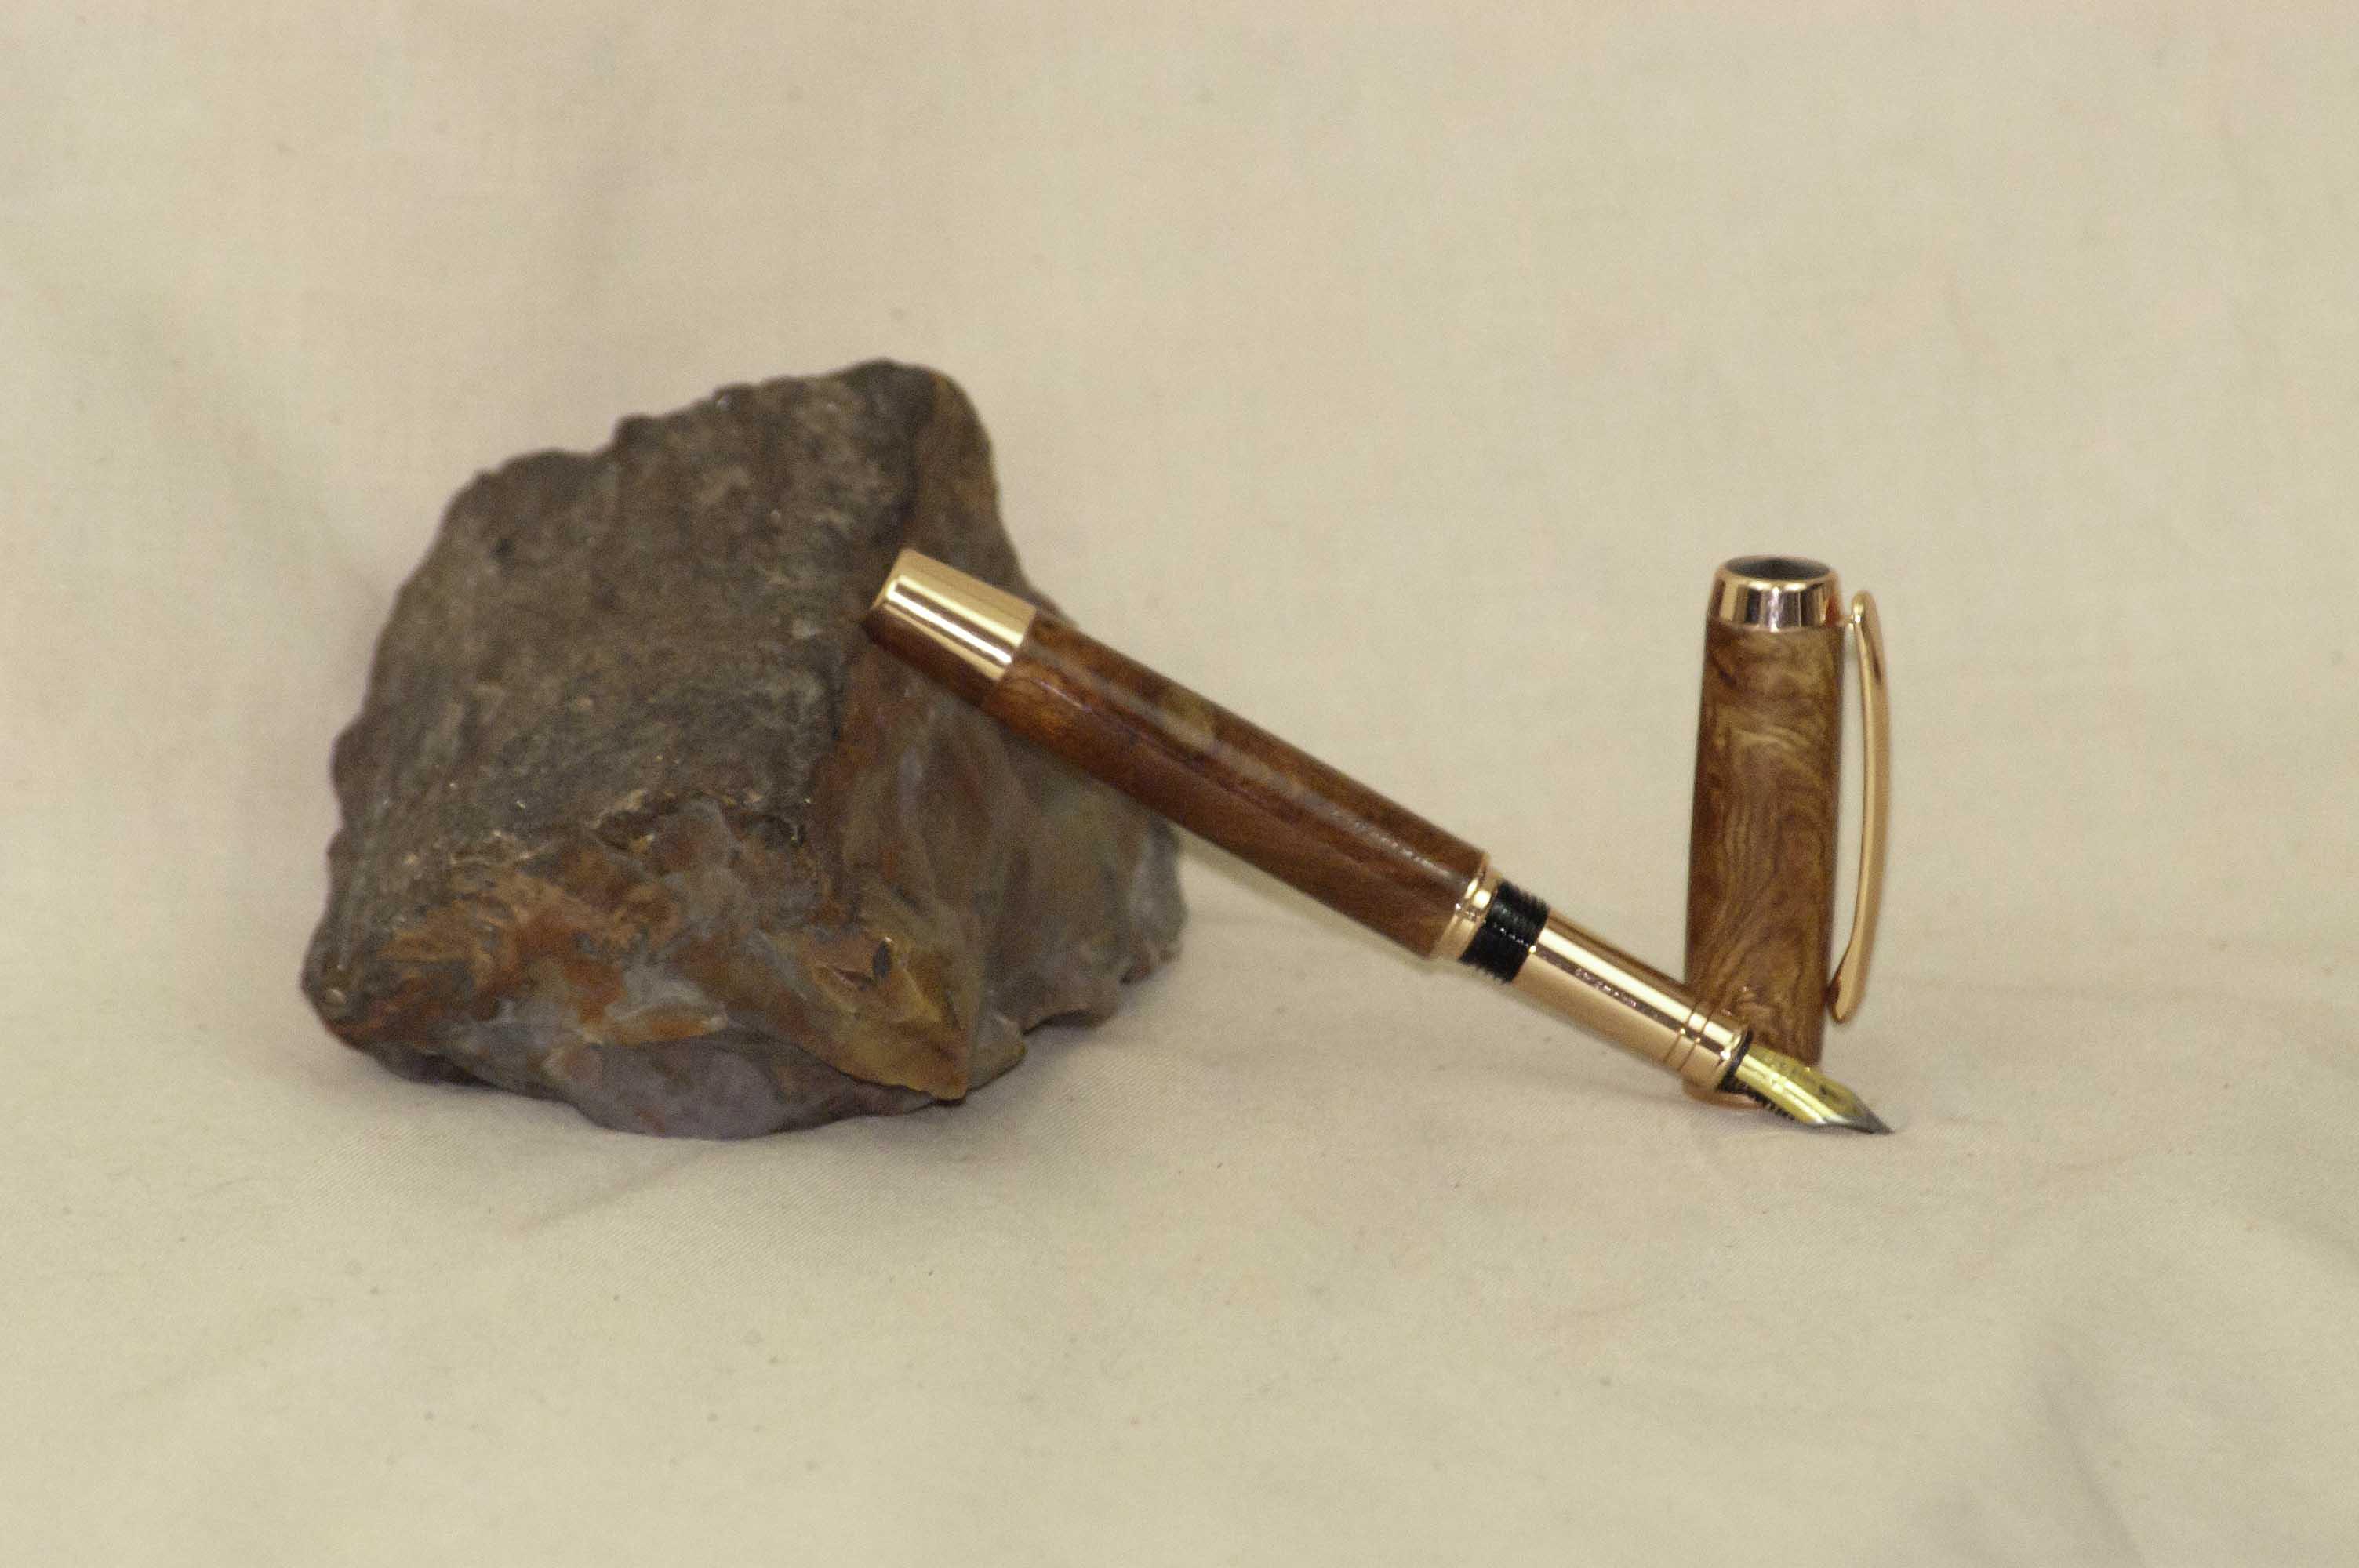 Amboyna Burl Fountain Pen